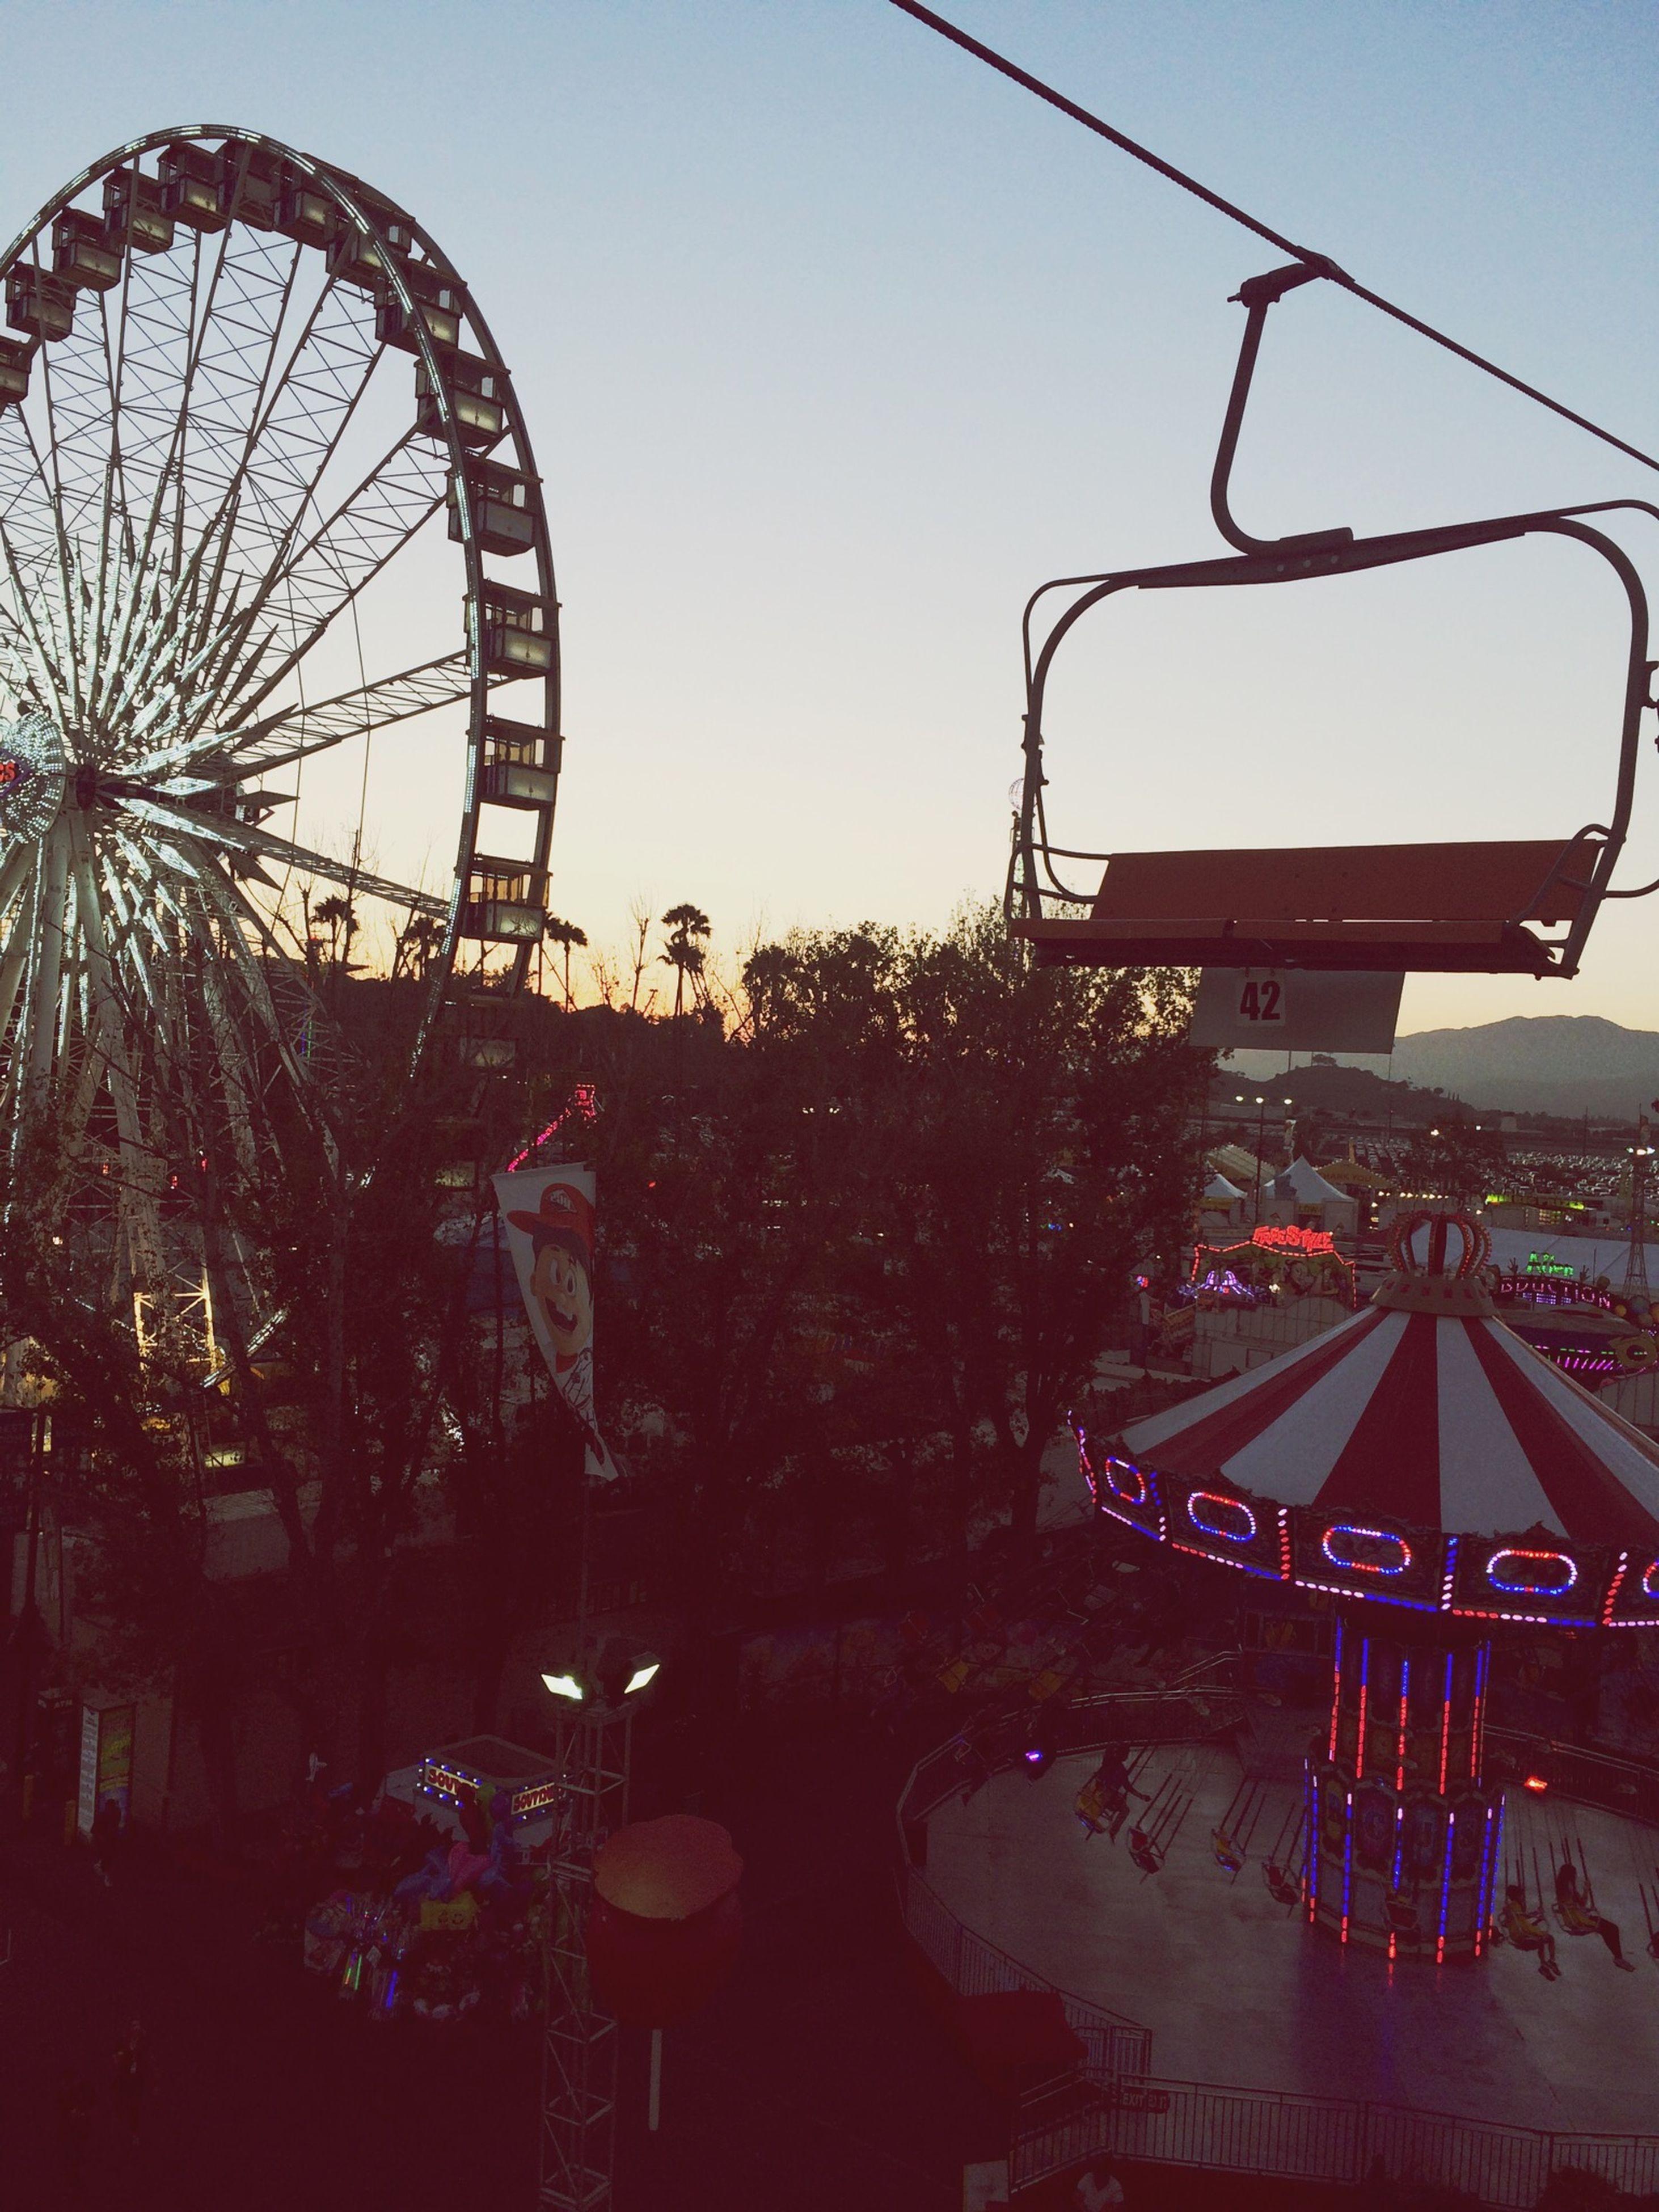 amusement park, ferris wheel, amusement park ride, arts culture and entertainment, sky, clear sky, built structure, architecture, illuminated, tree, building exterior, dusk, outdoors, transportation, incidental people, travel destinations, city, water, low angle view, fun